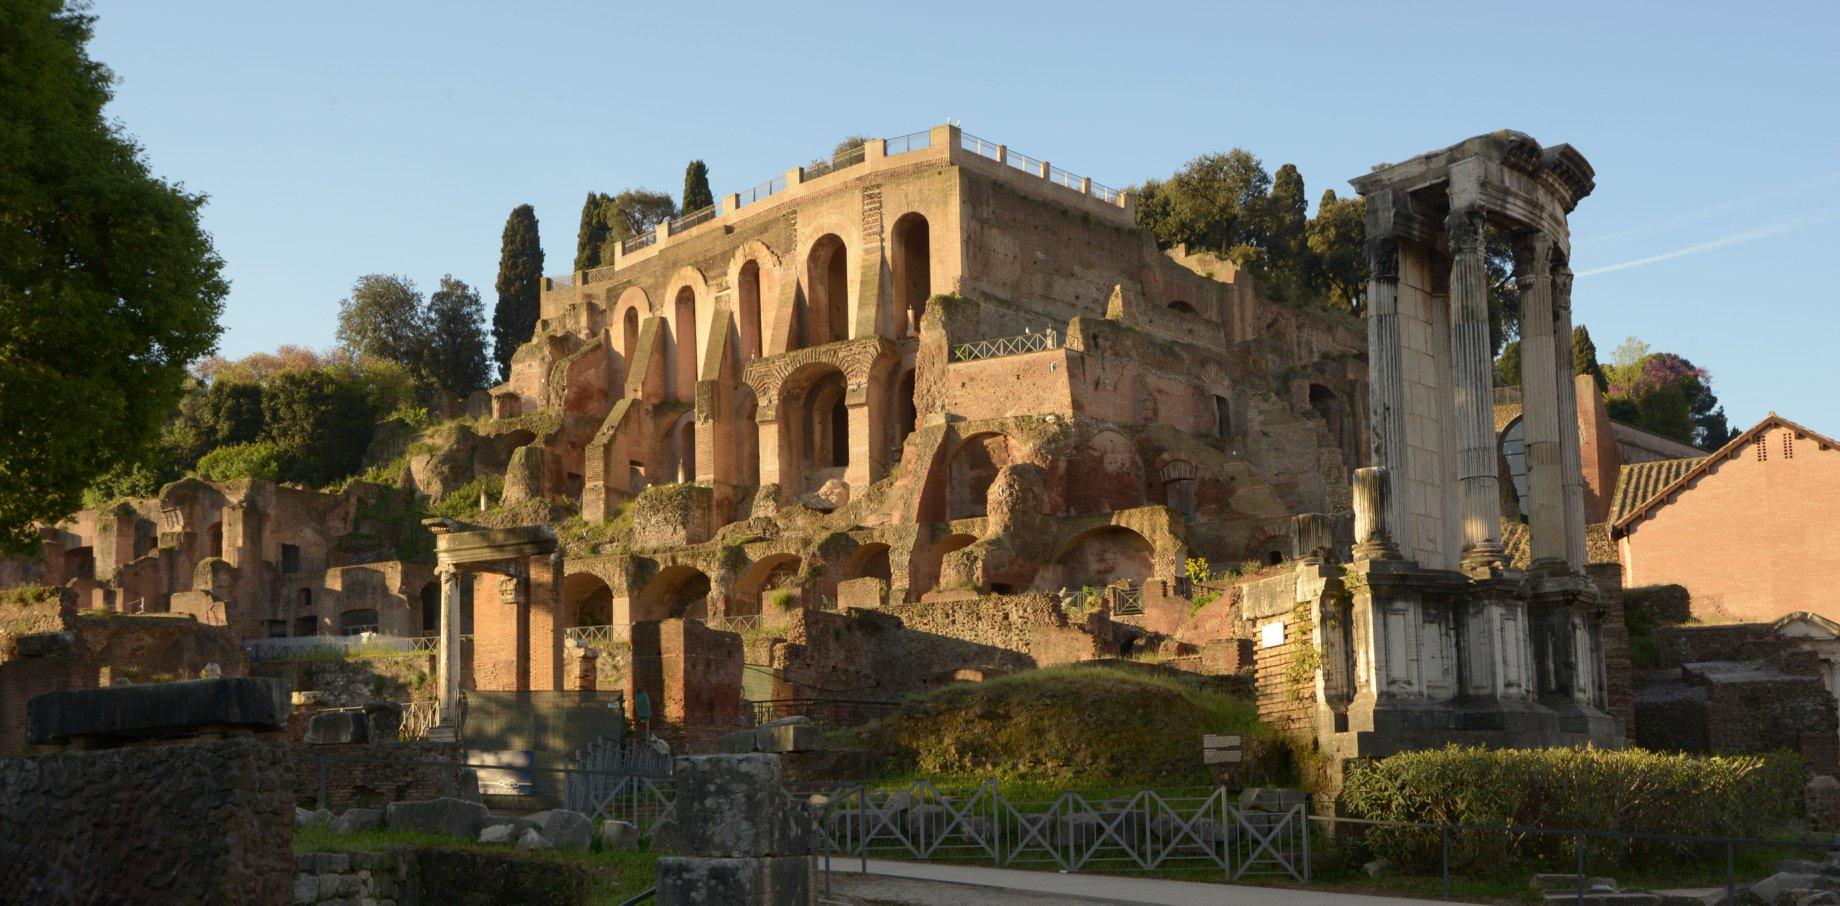 Meraviglie romane. Dopo 40 anni torna visitabile la Domus Tiberiana